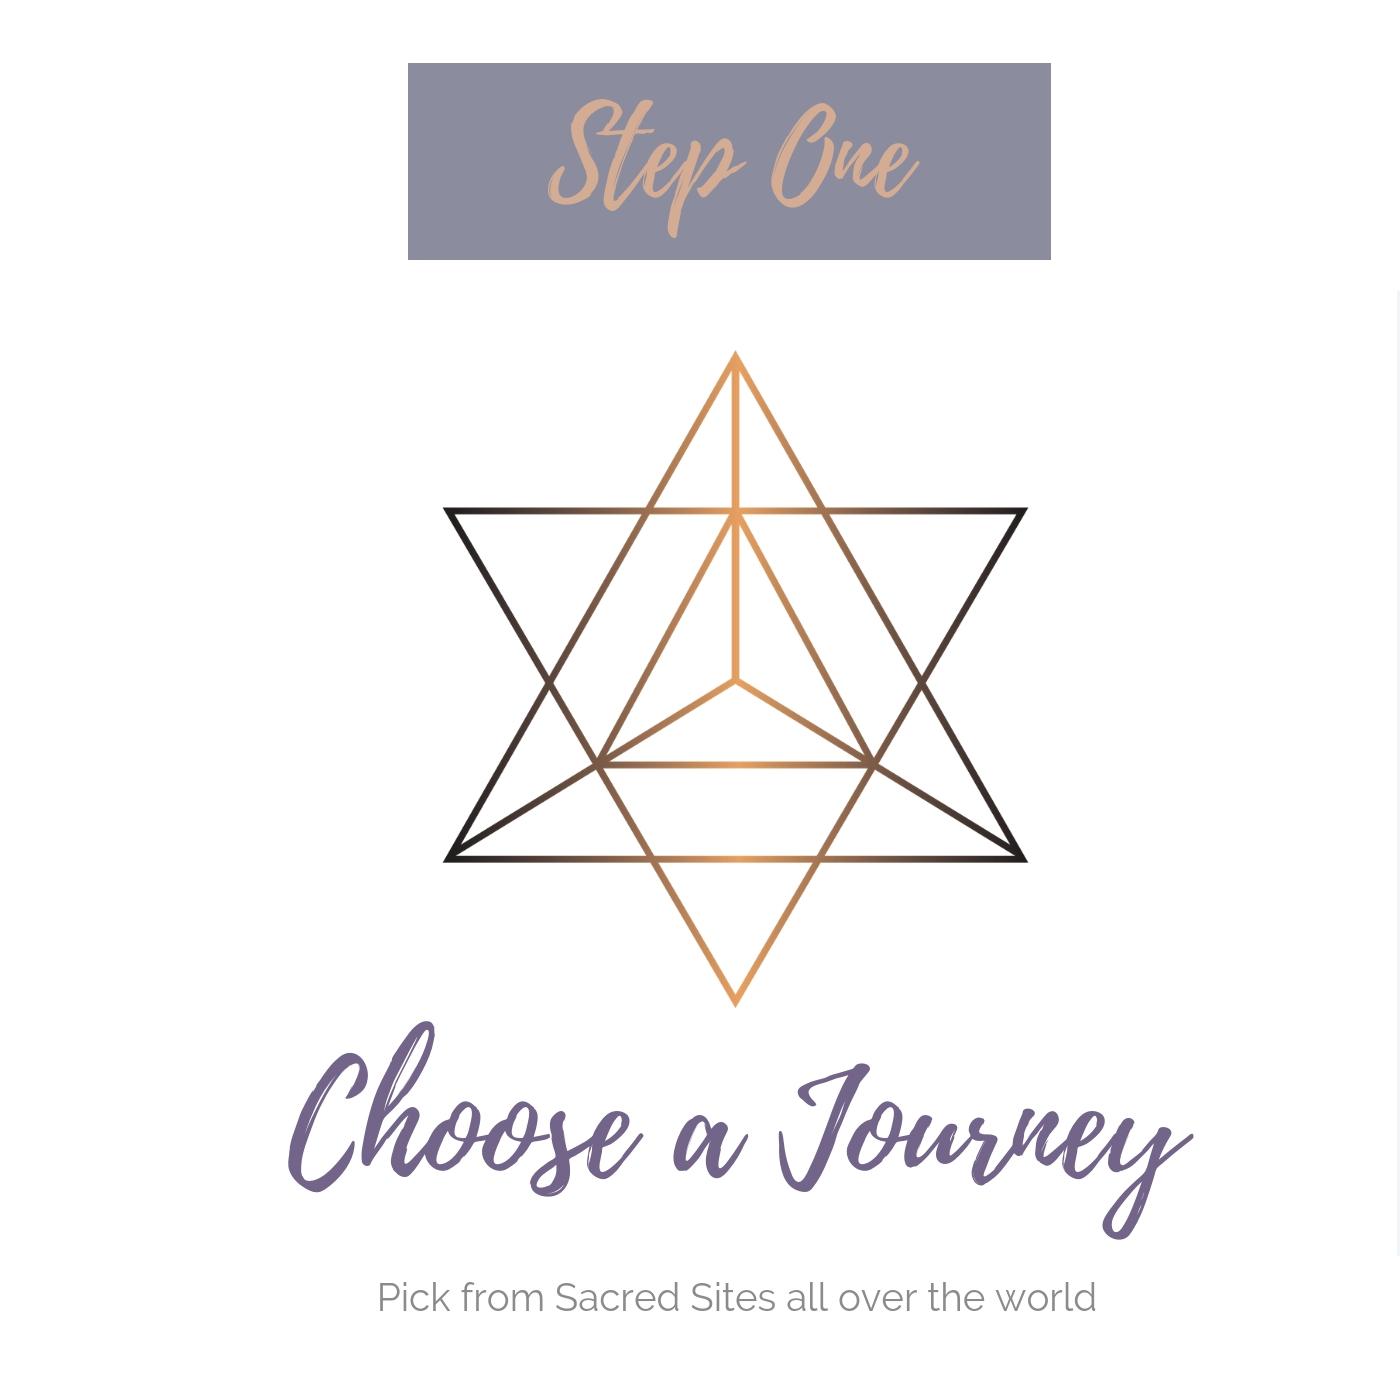 choose your journey copy 2.jpg